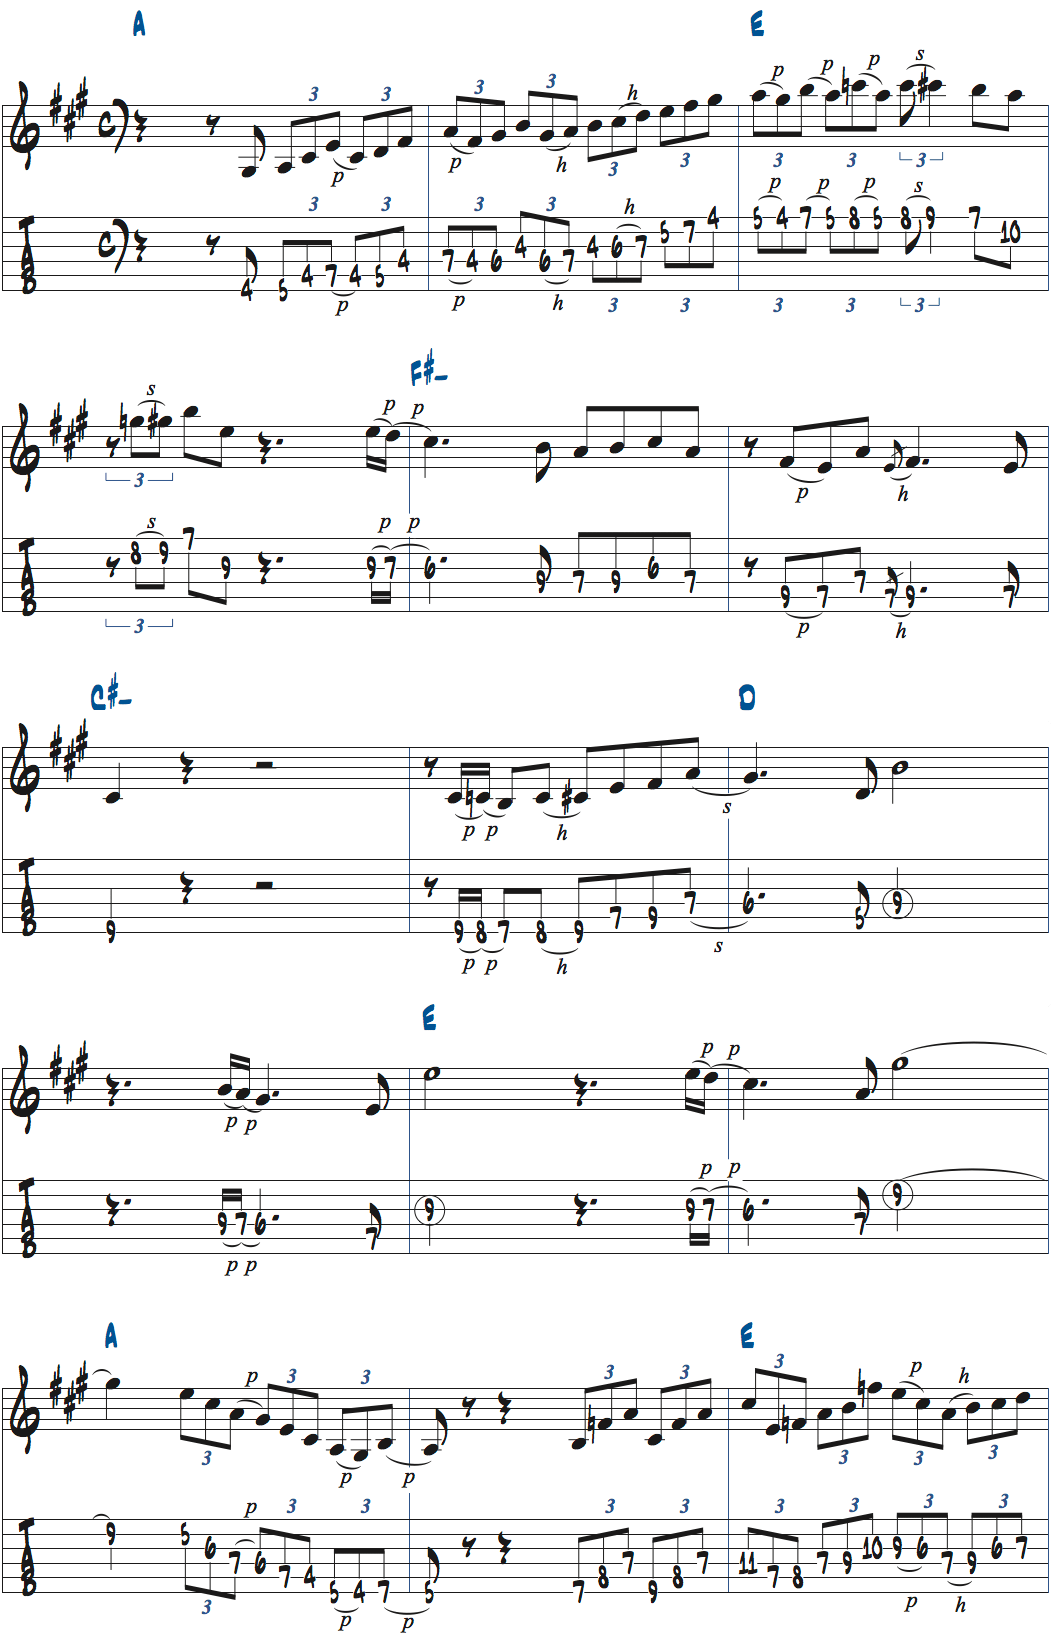 A-E-F#m-C#m-D-E-A-Eでジャズっぽくアドリブした例楽譜ページ1楽譜